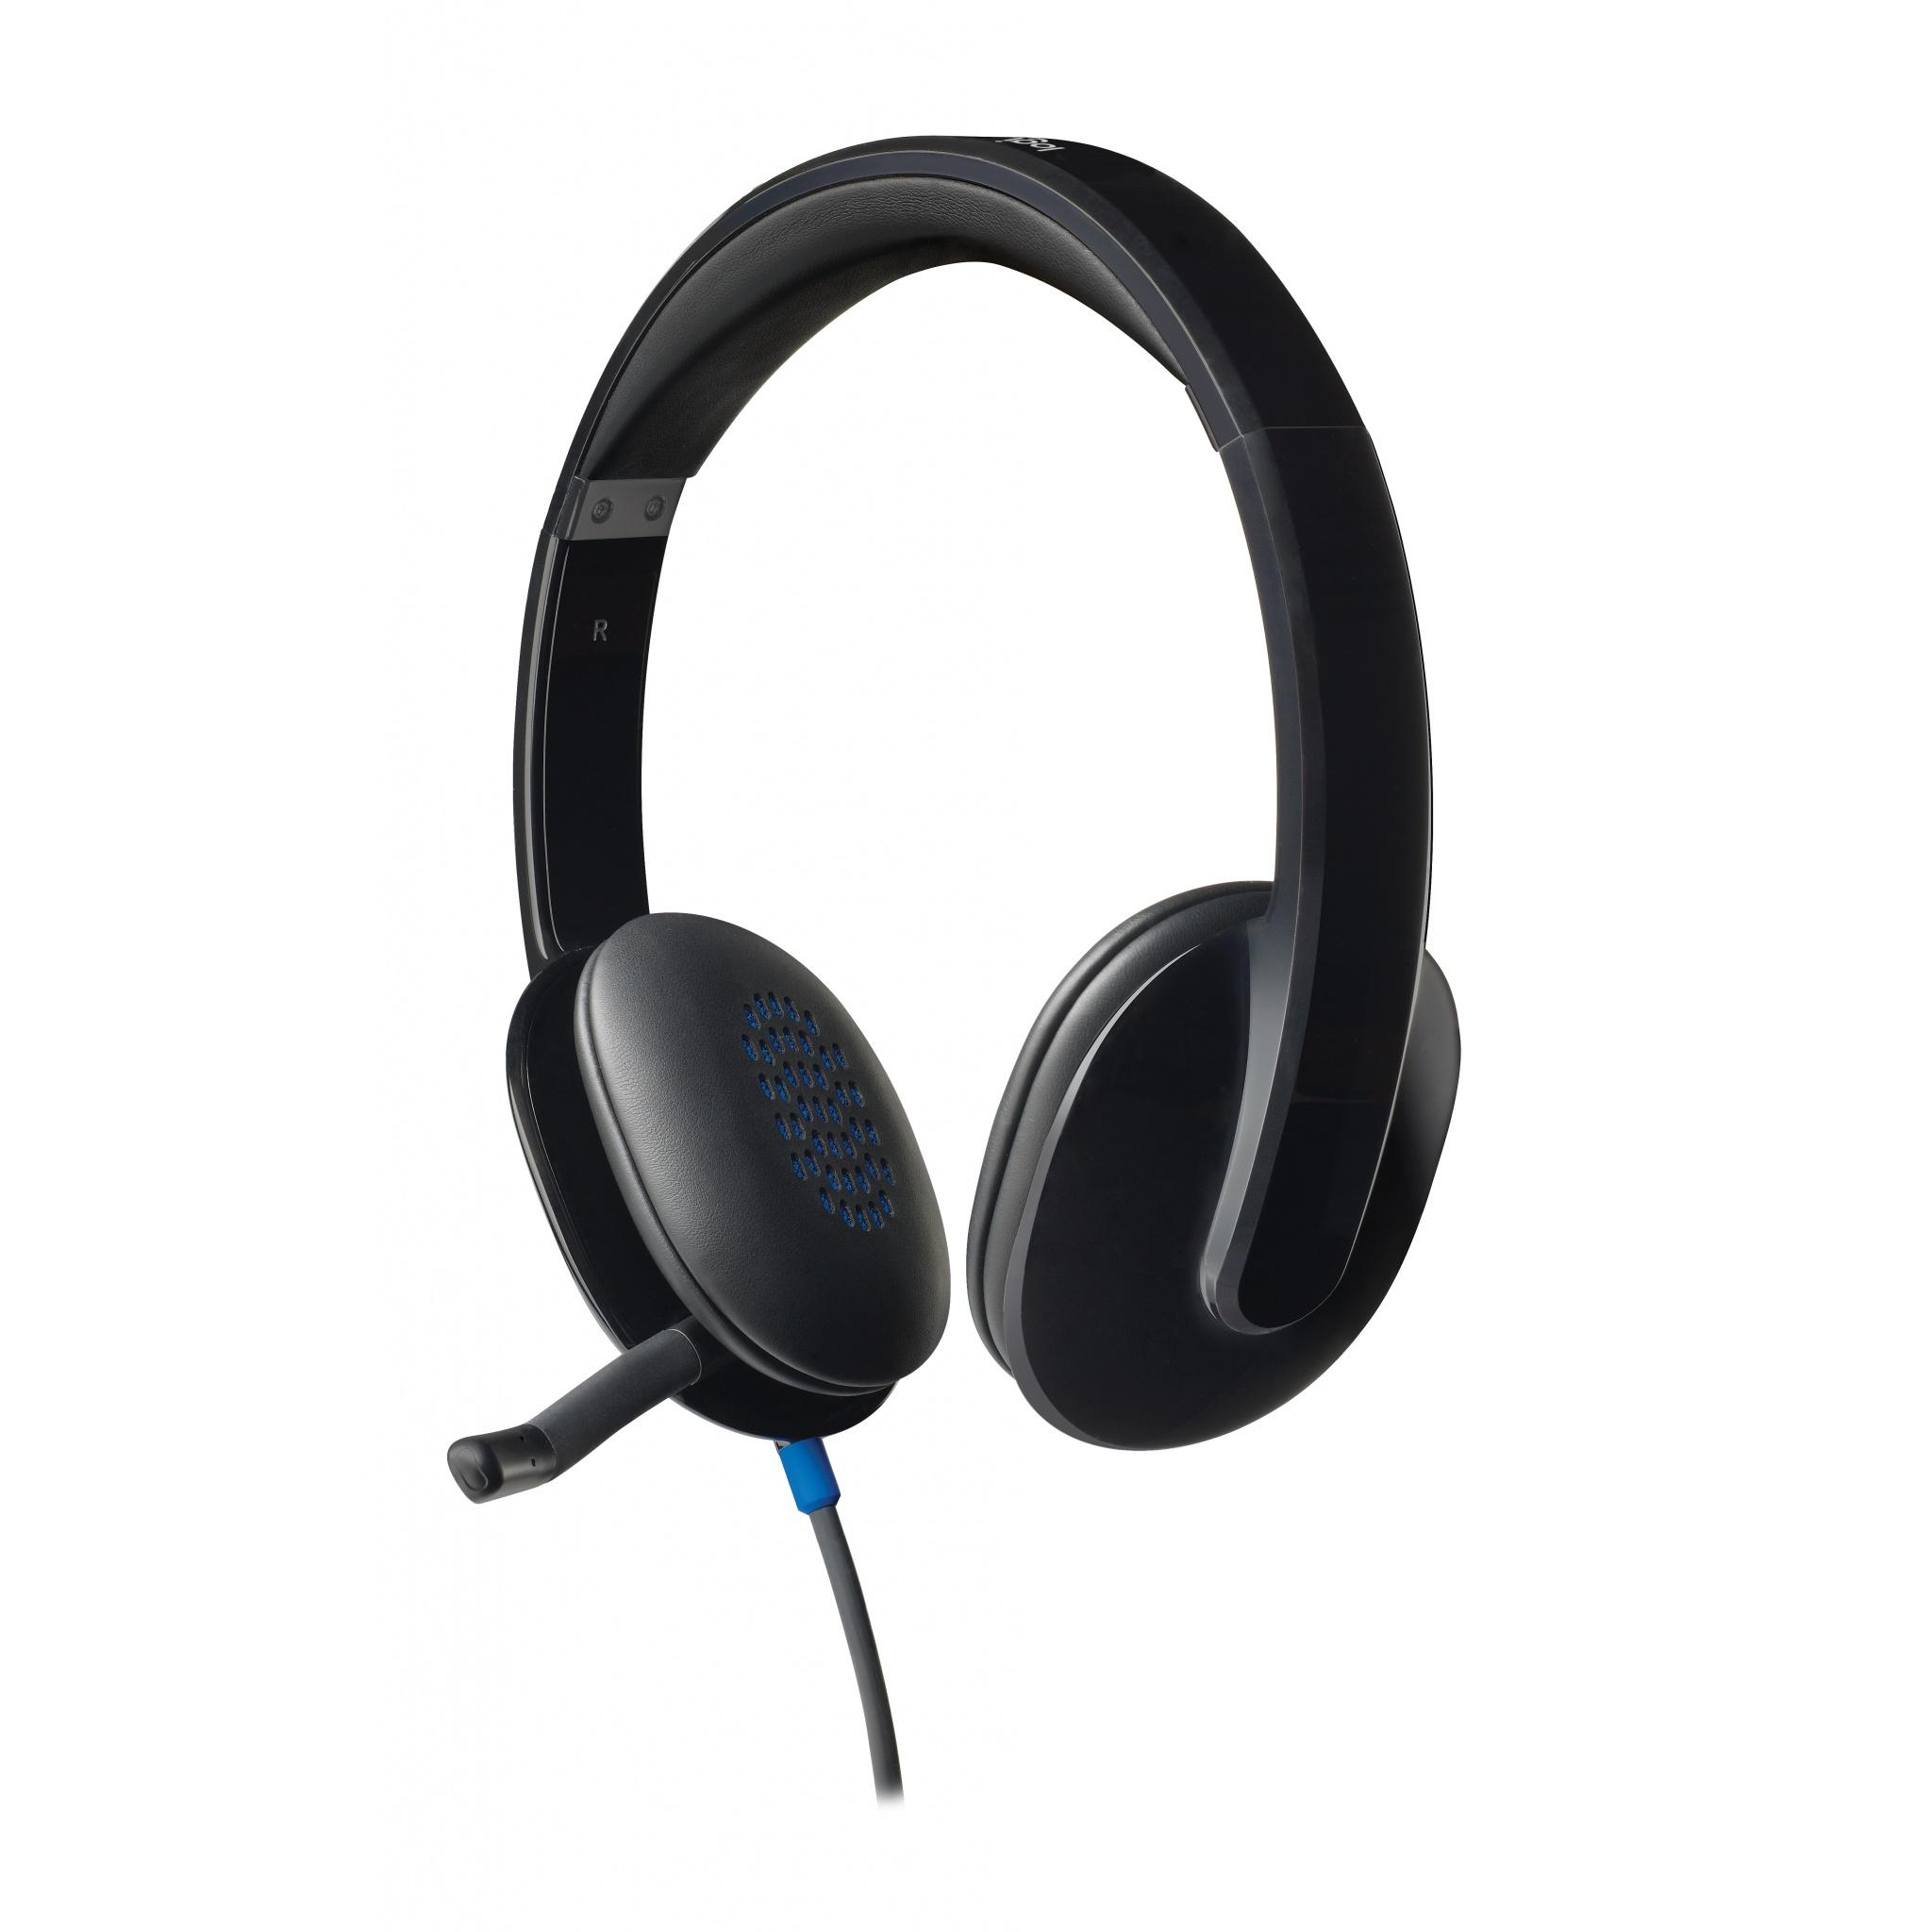 Logitech H540 Binaural filaire casque USB3.0 - noir